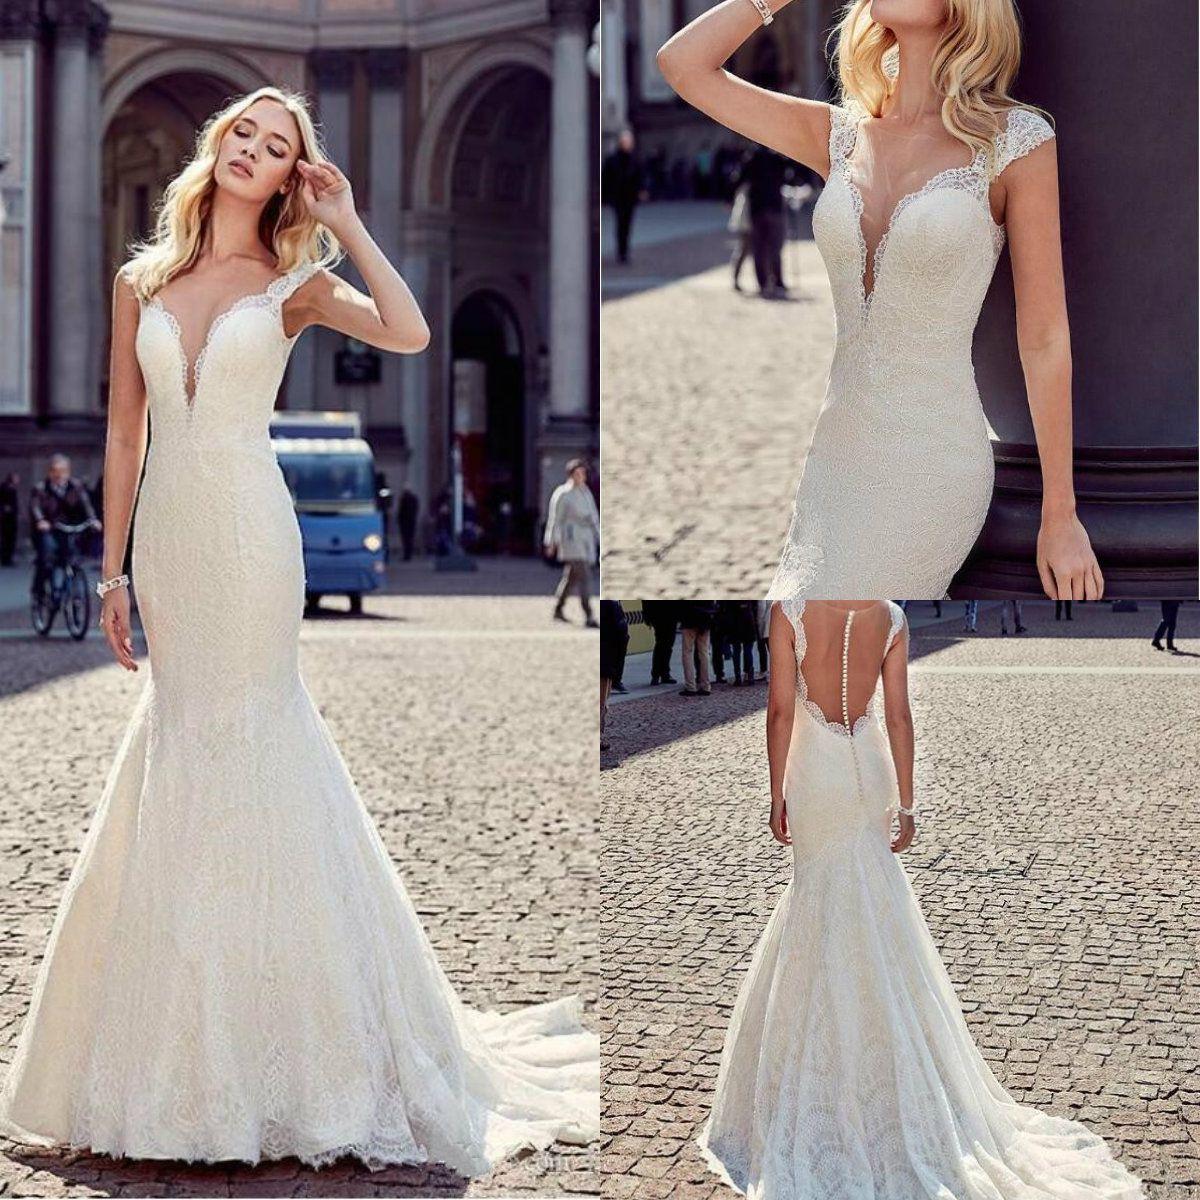 Newdeve White Halter Sleeveless Wedding Dresses Lace Tulle Slim Fit Sweep Train Bridal Dresses